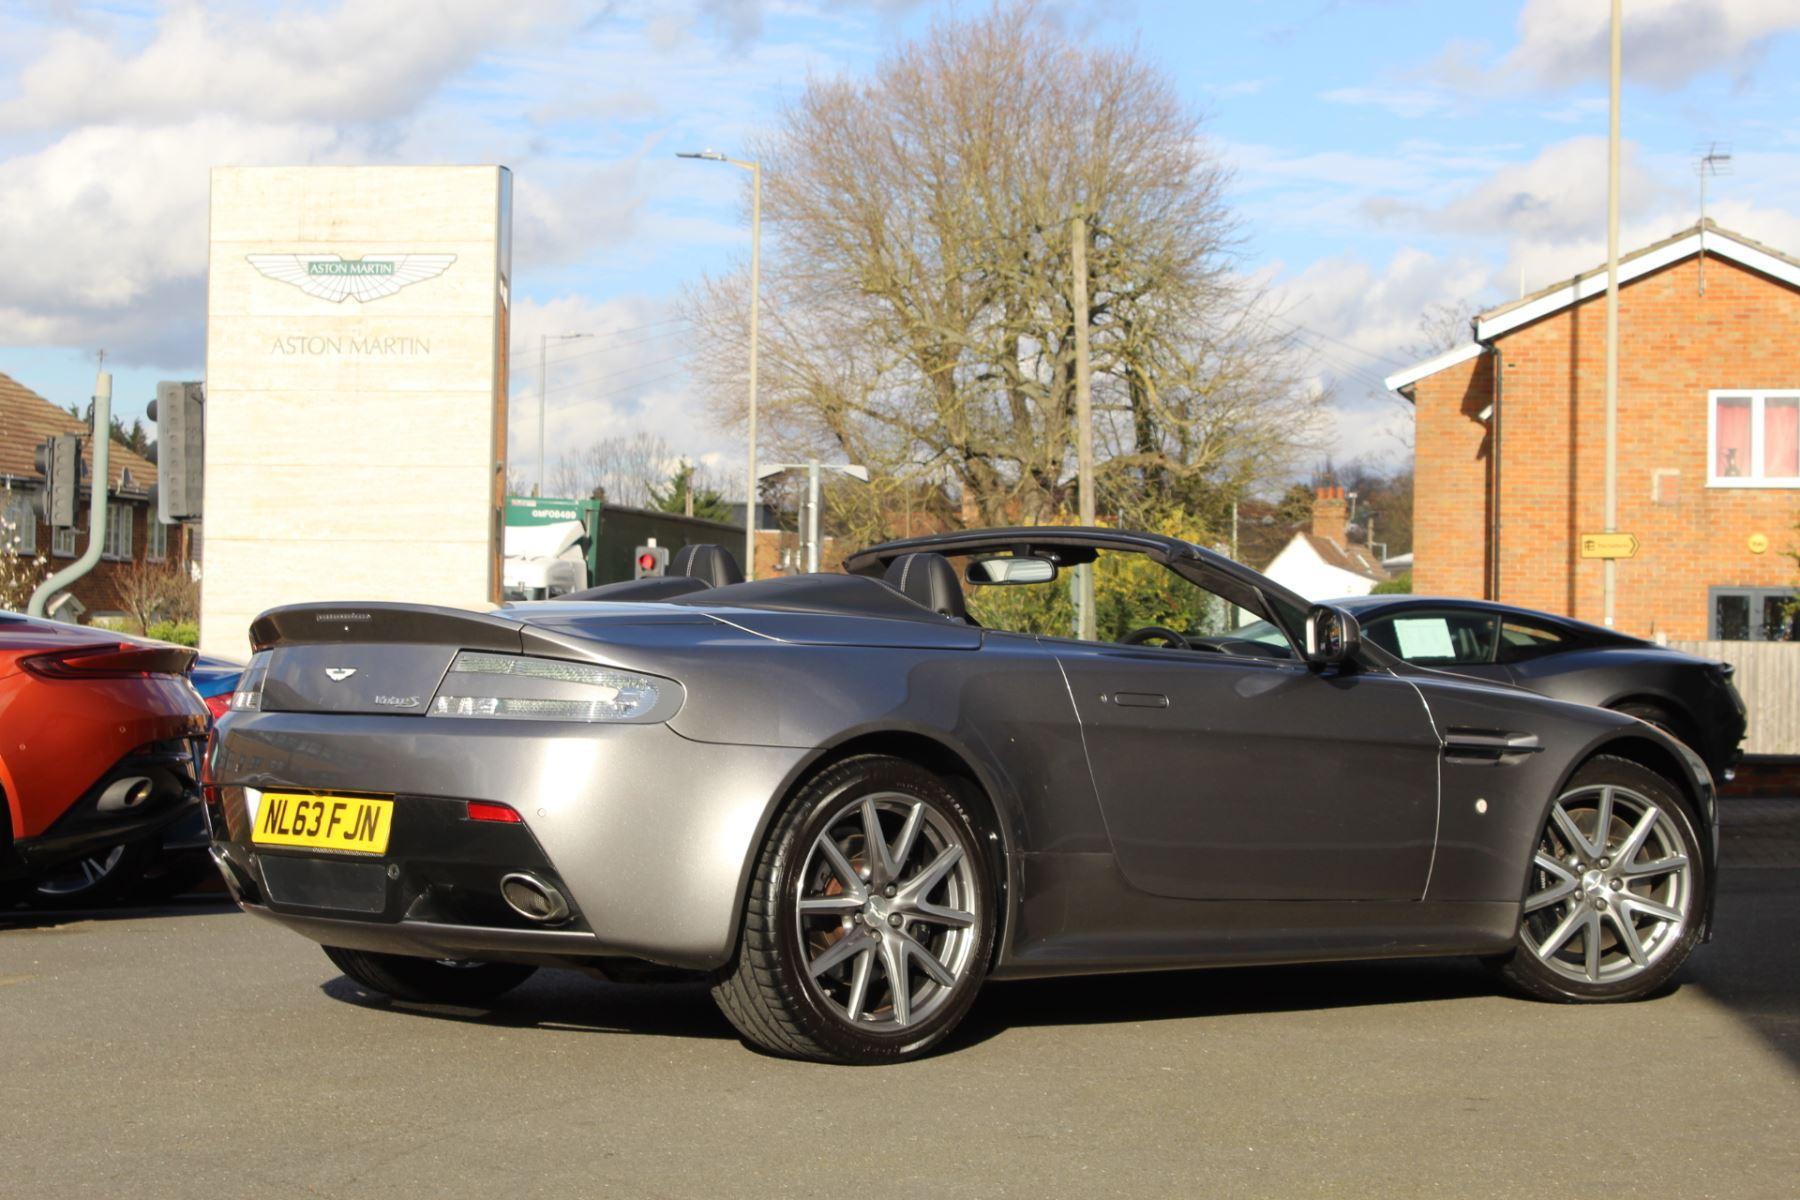 Aston Martin V8 Vantage S Roadster S 2dr Sportshift  Rare S Model  image 12